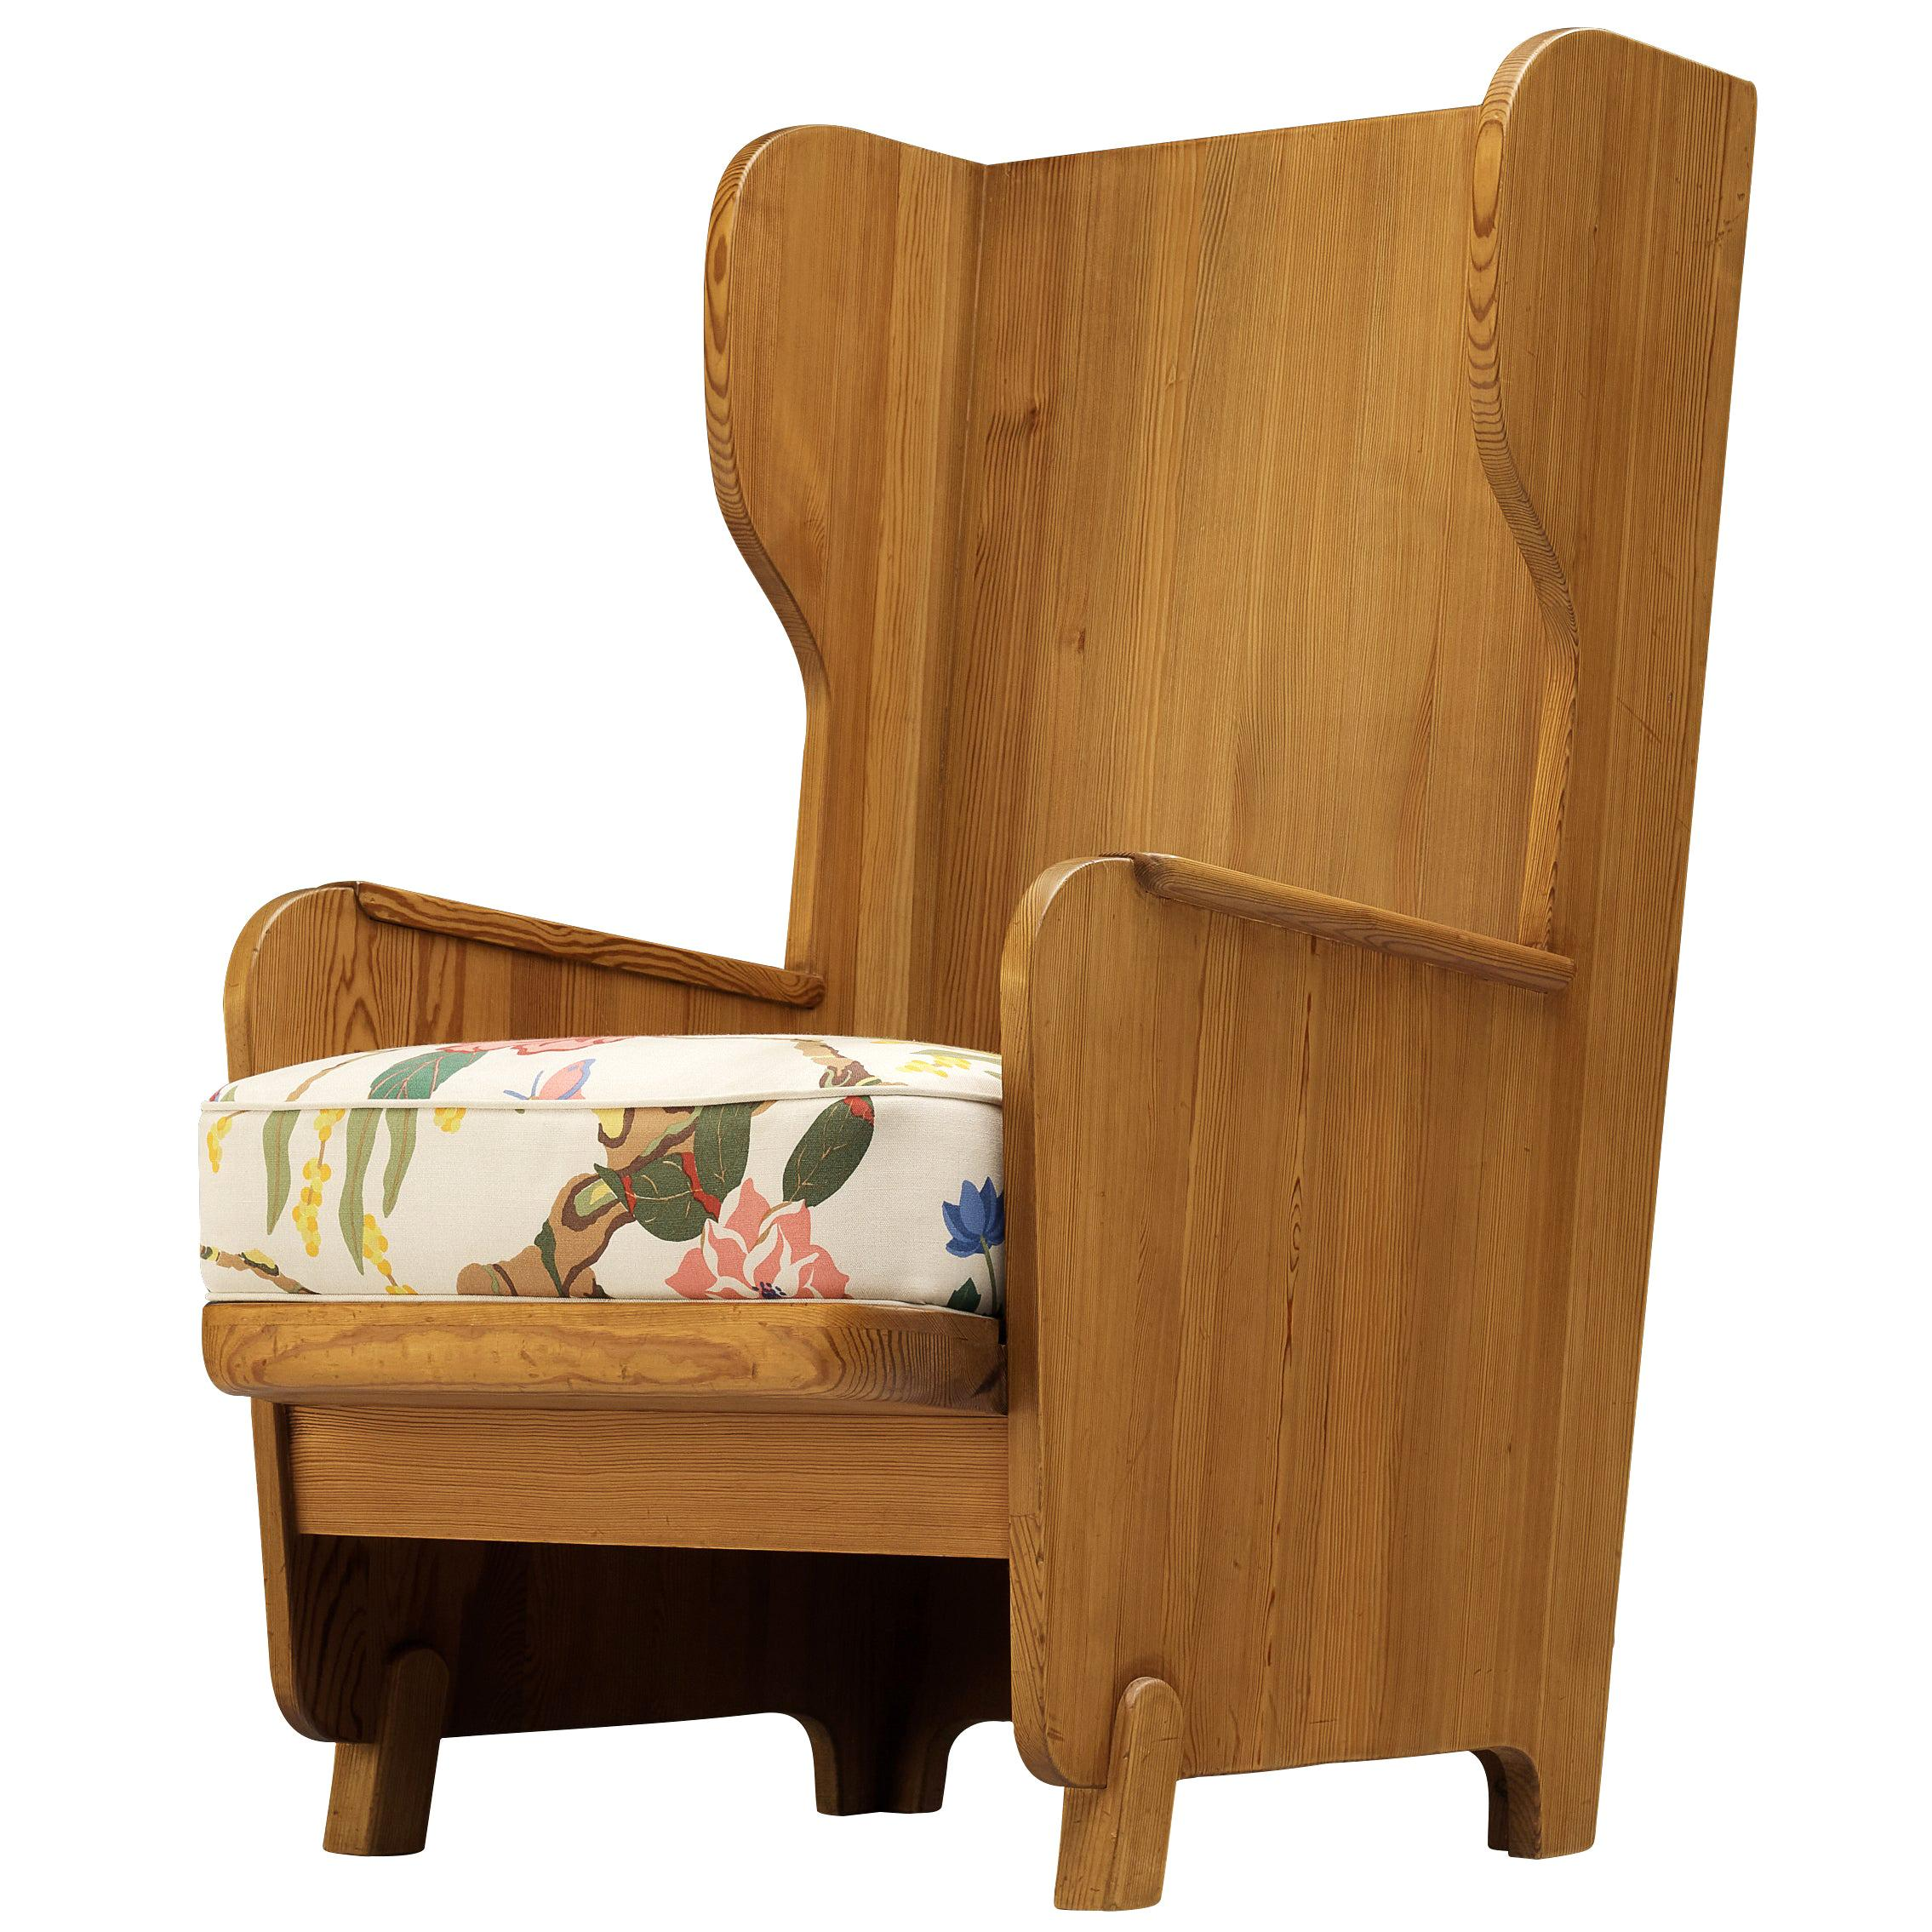 Axel Einar Hjorth 'Lovo' Chair in Pine